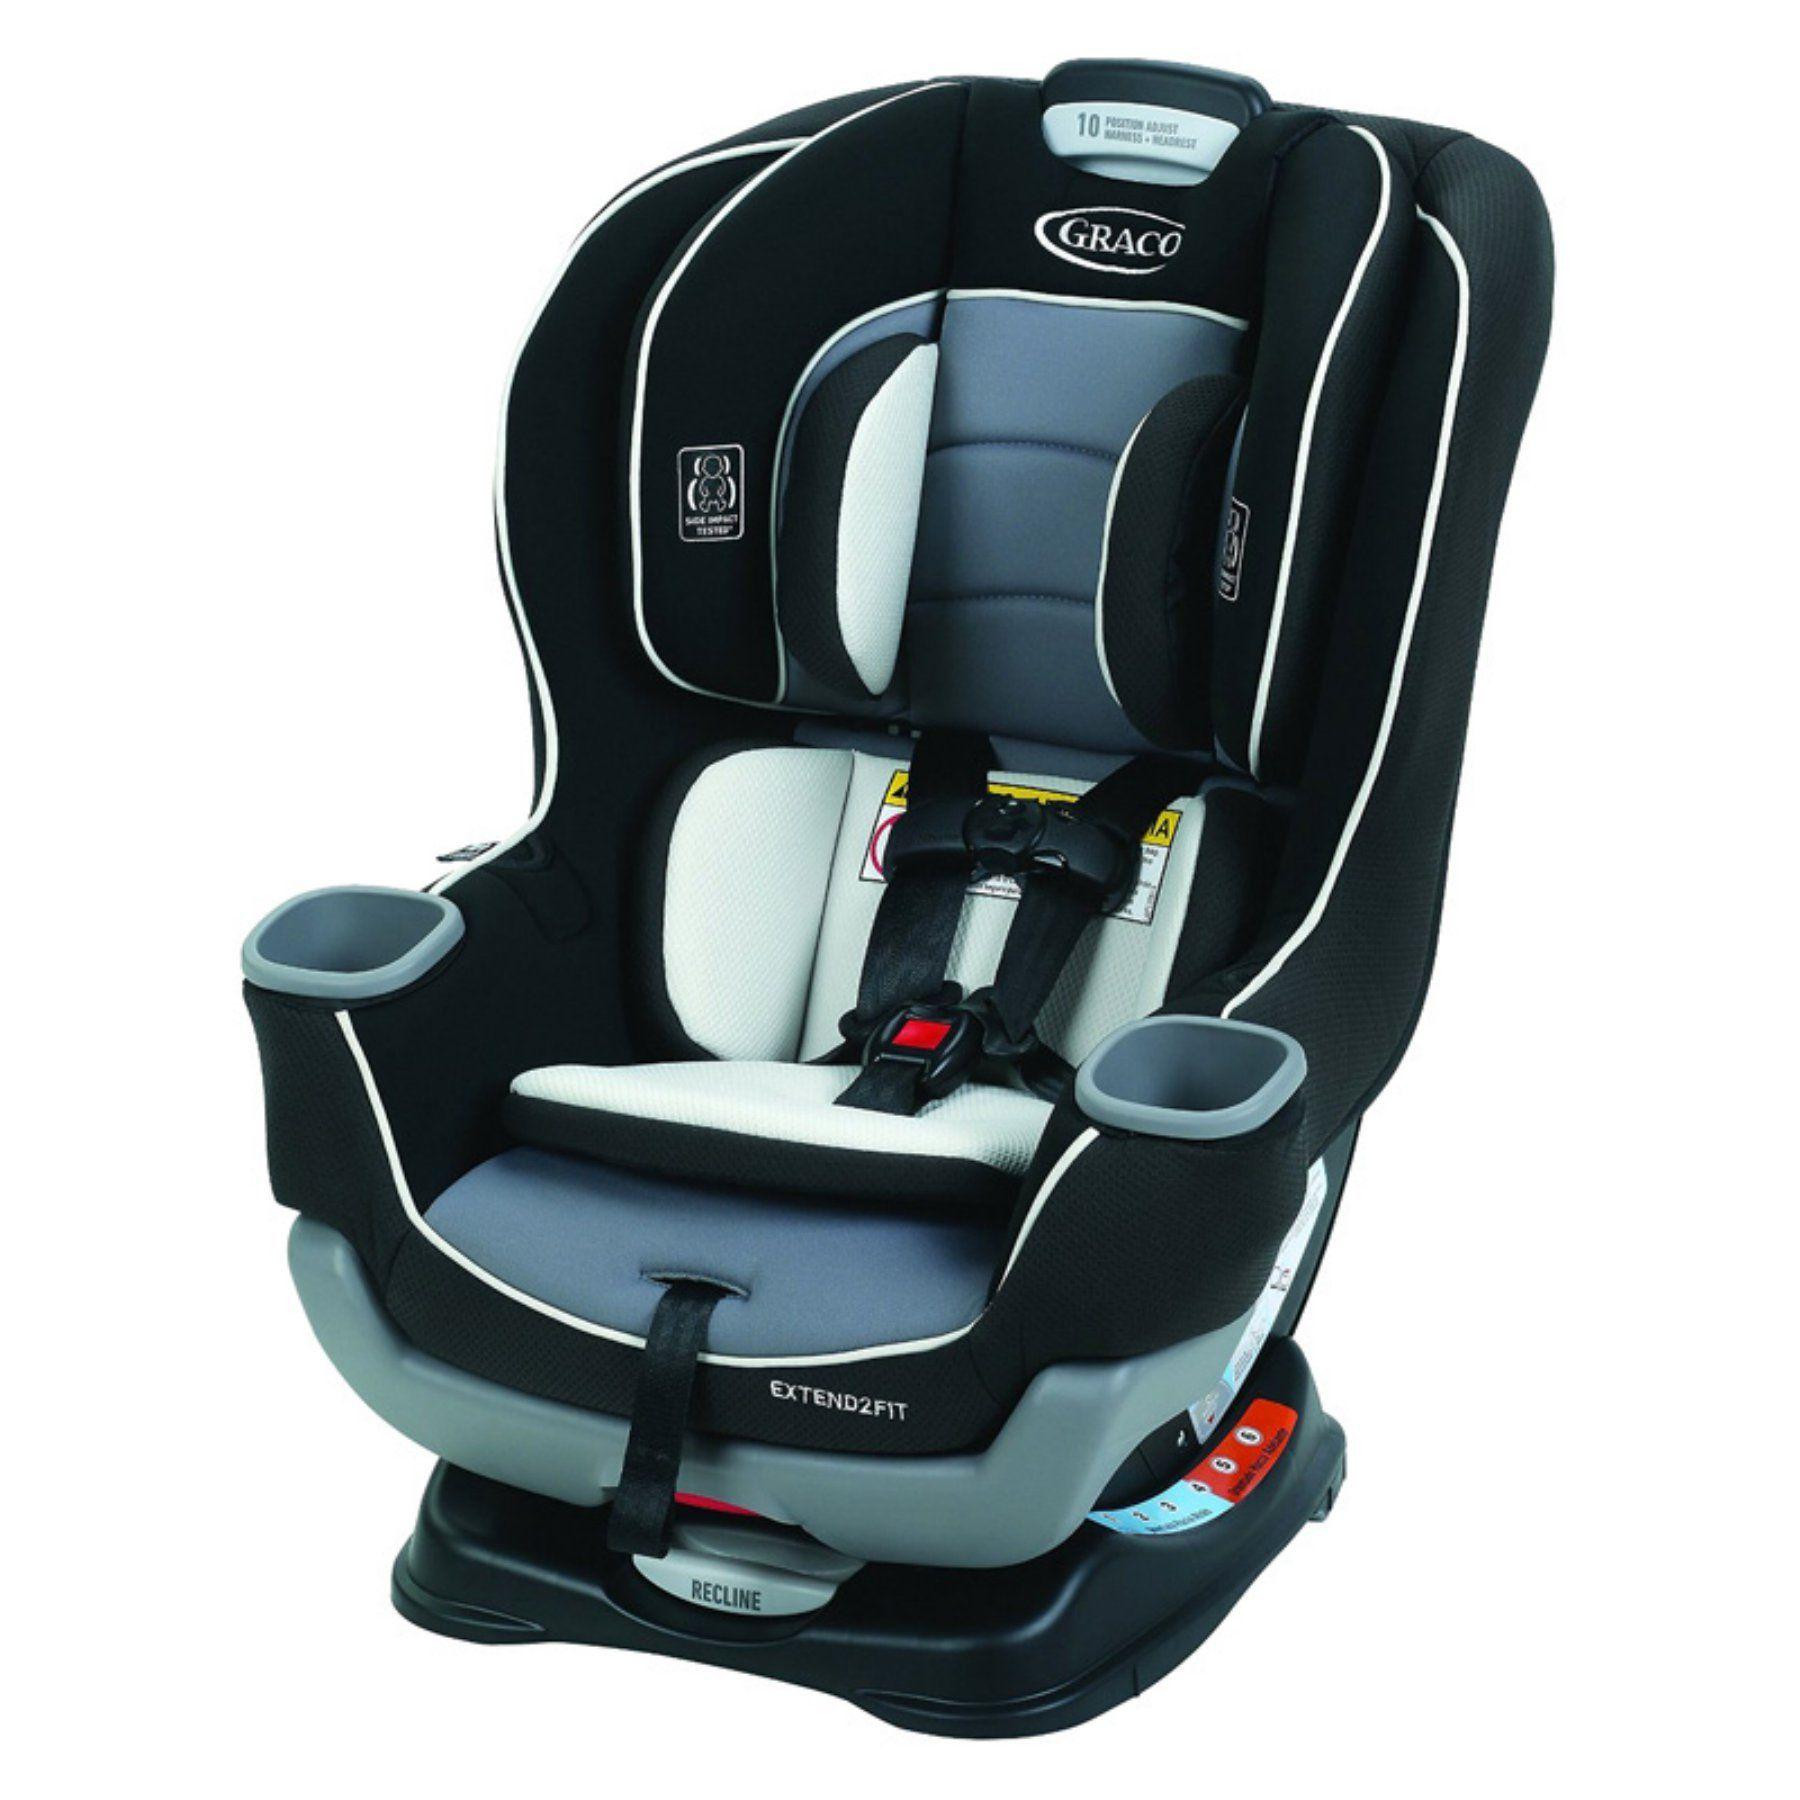 Graco extend2fit convertible car seat gotham 1963212